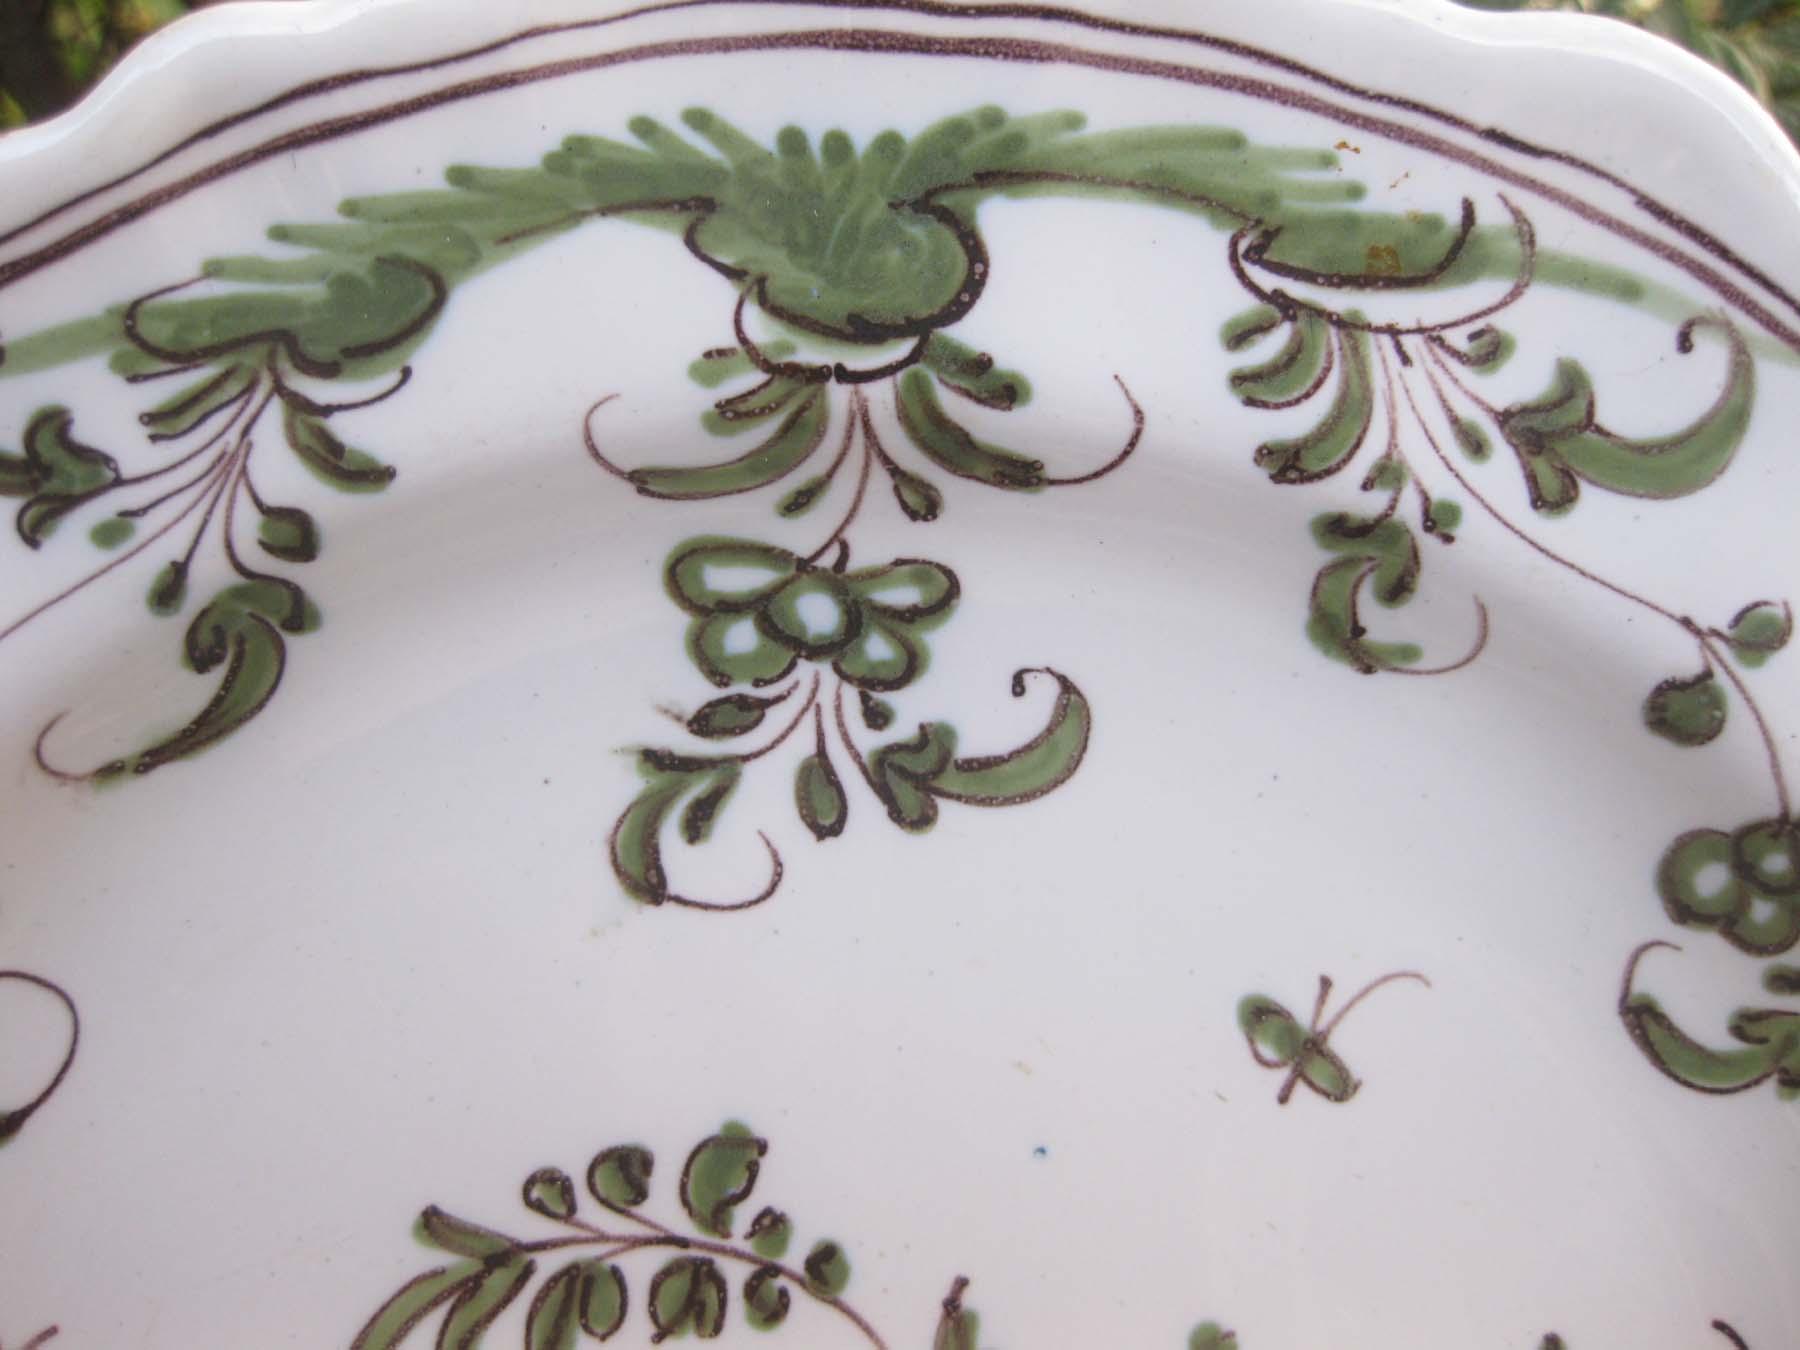 galeris-bosetti-antiquites,Moustiers camaIeu vert, bord et aile